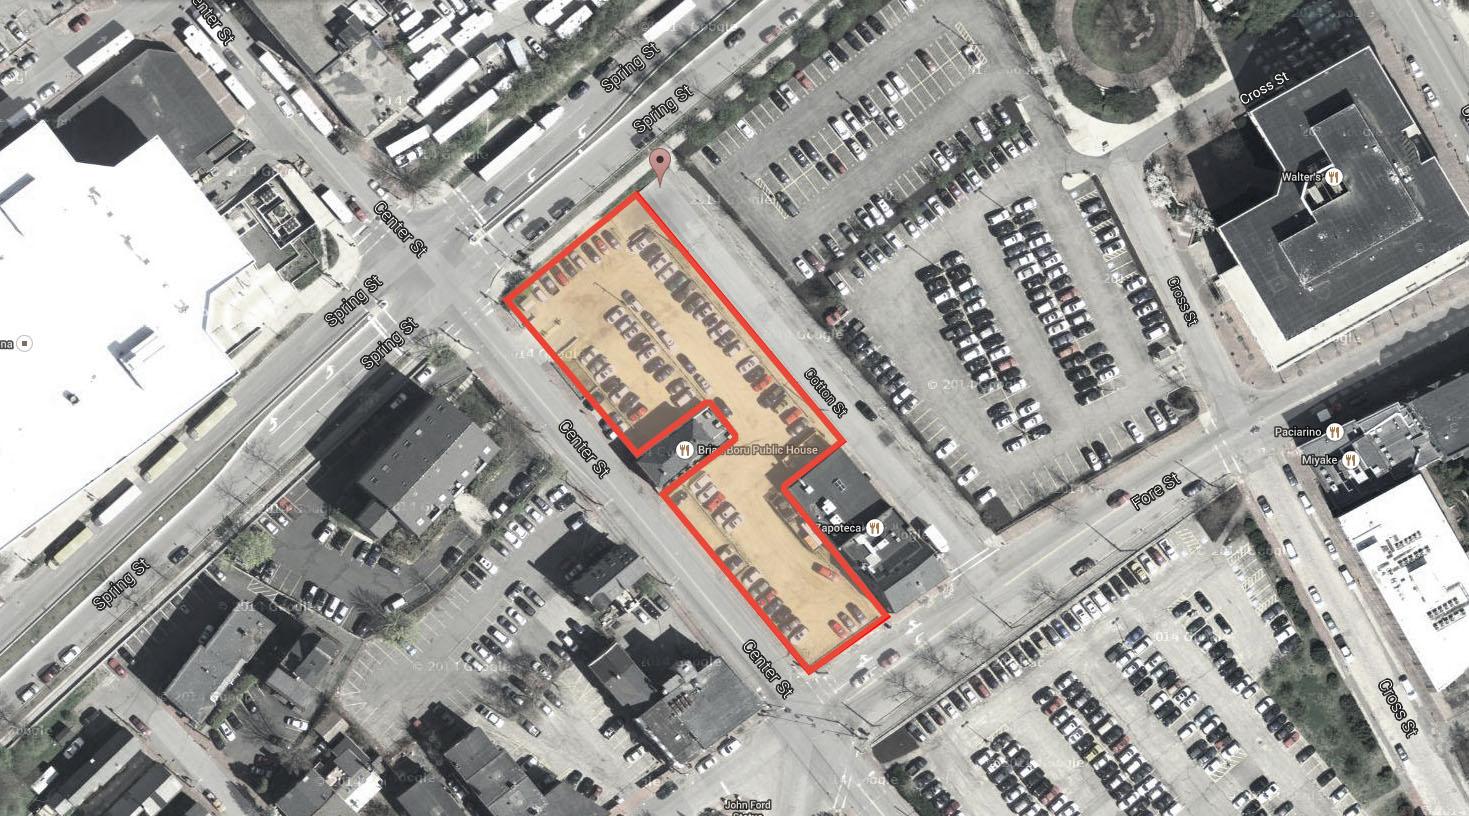 Portland.ME.Robert_Orr_&_Assoc.Cotton_Street.Mixed-Use_Development.Satelite_View_Existing copy.jpg